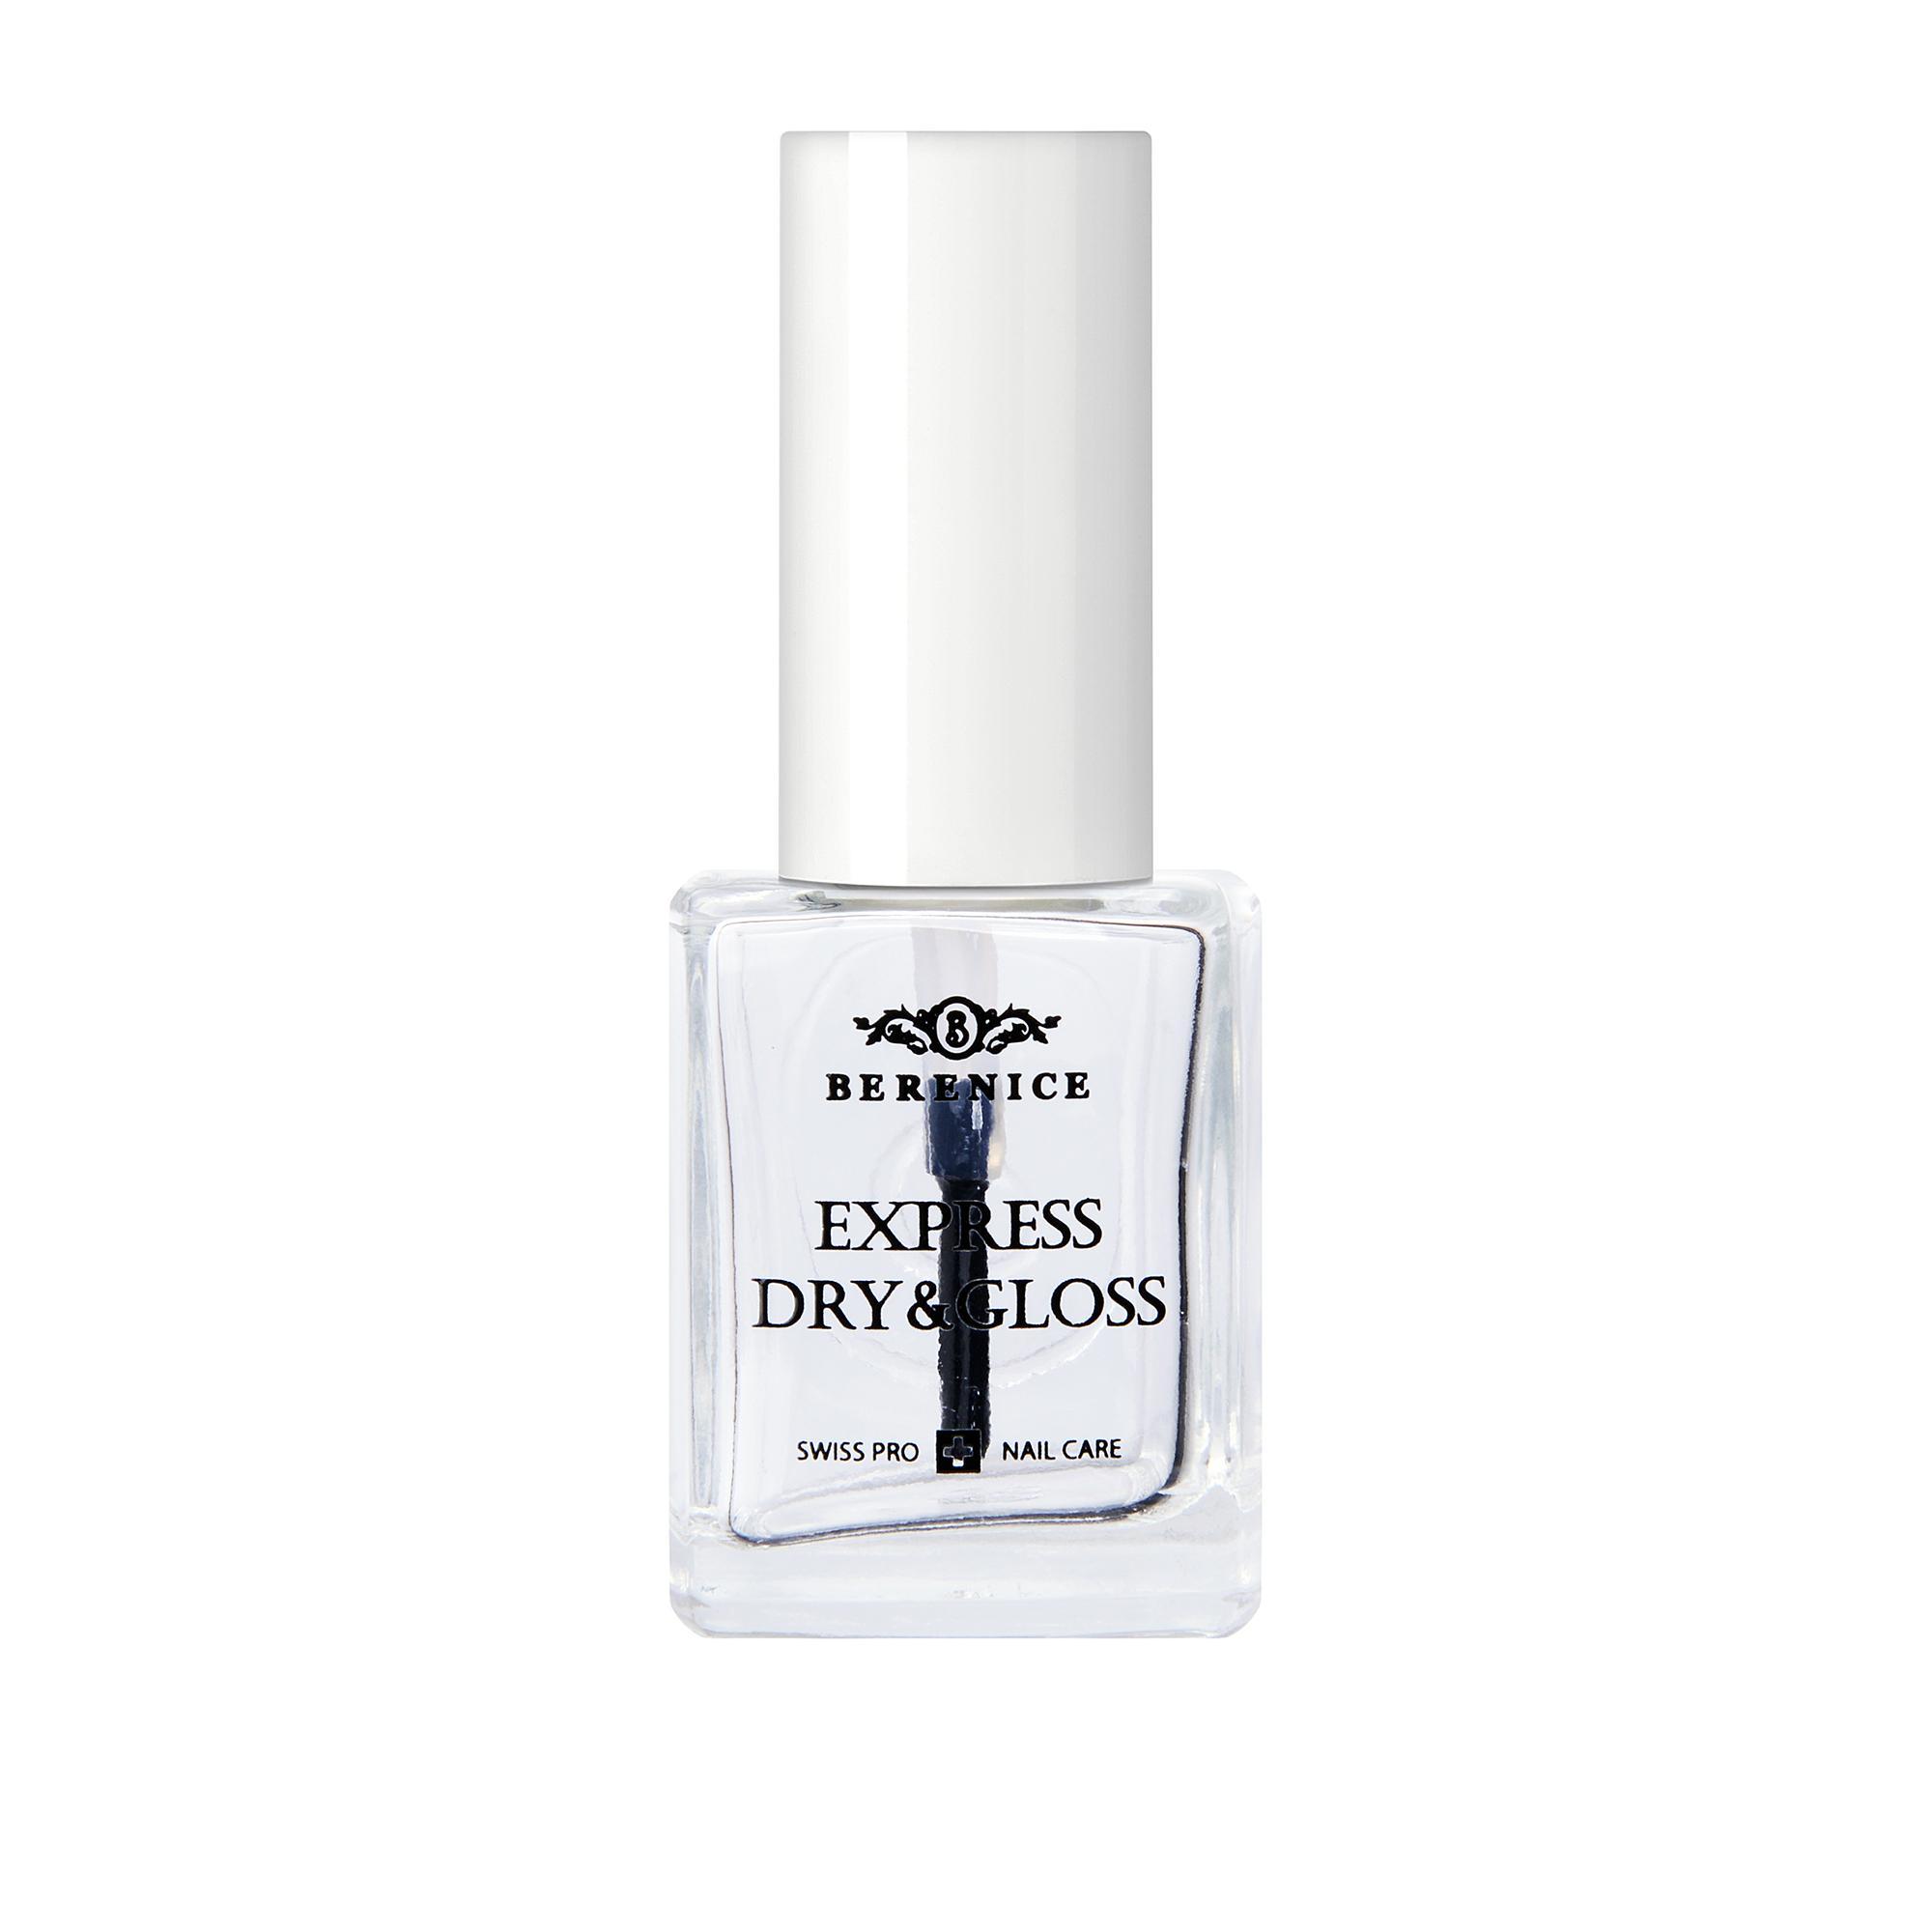 BERENICE Экспресс-покрытие 2 в 1 (сушка + блеск) / Express dry & gloss 16 мл -  Сушки